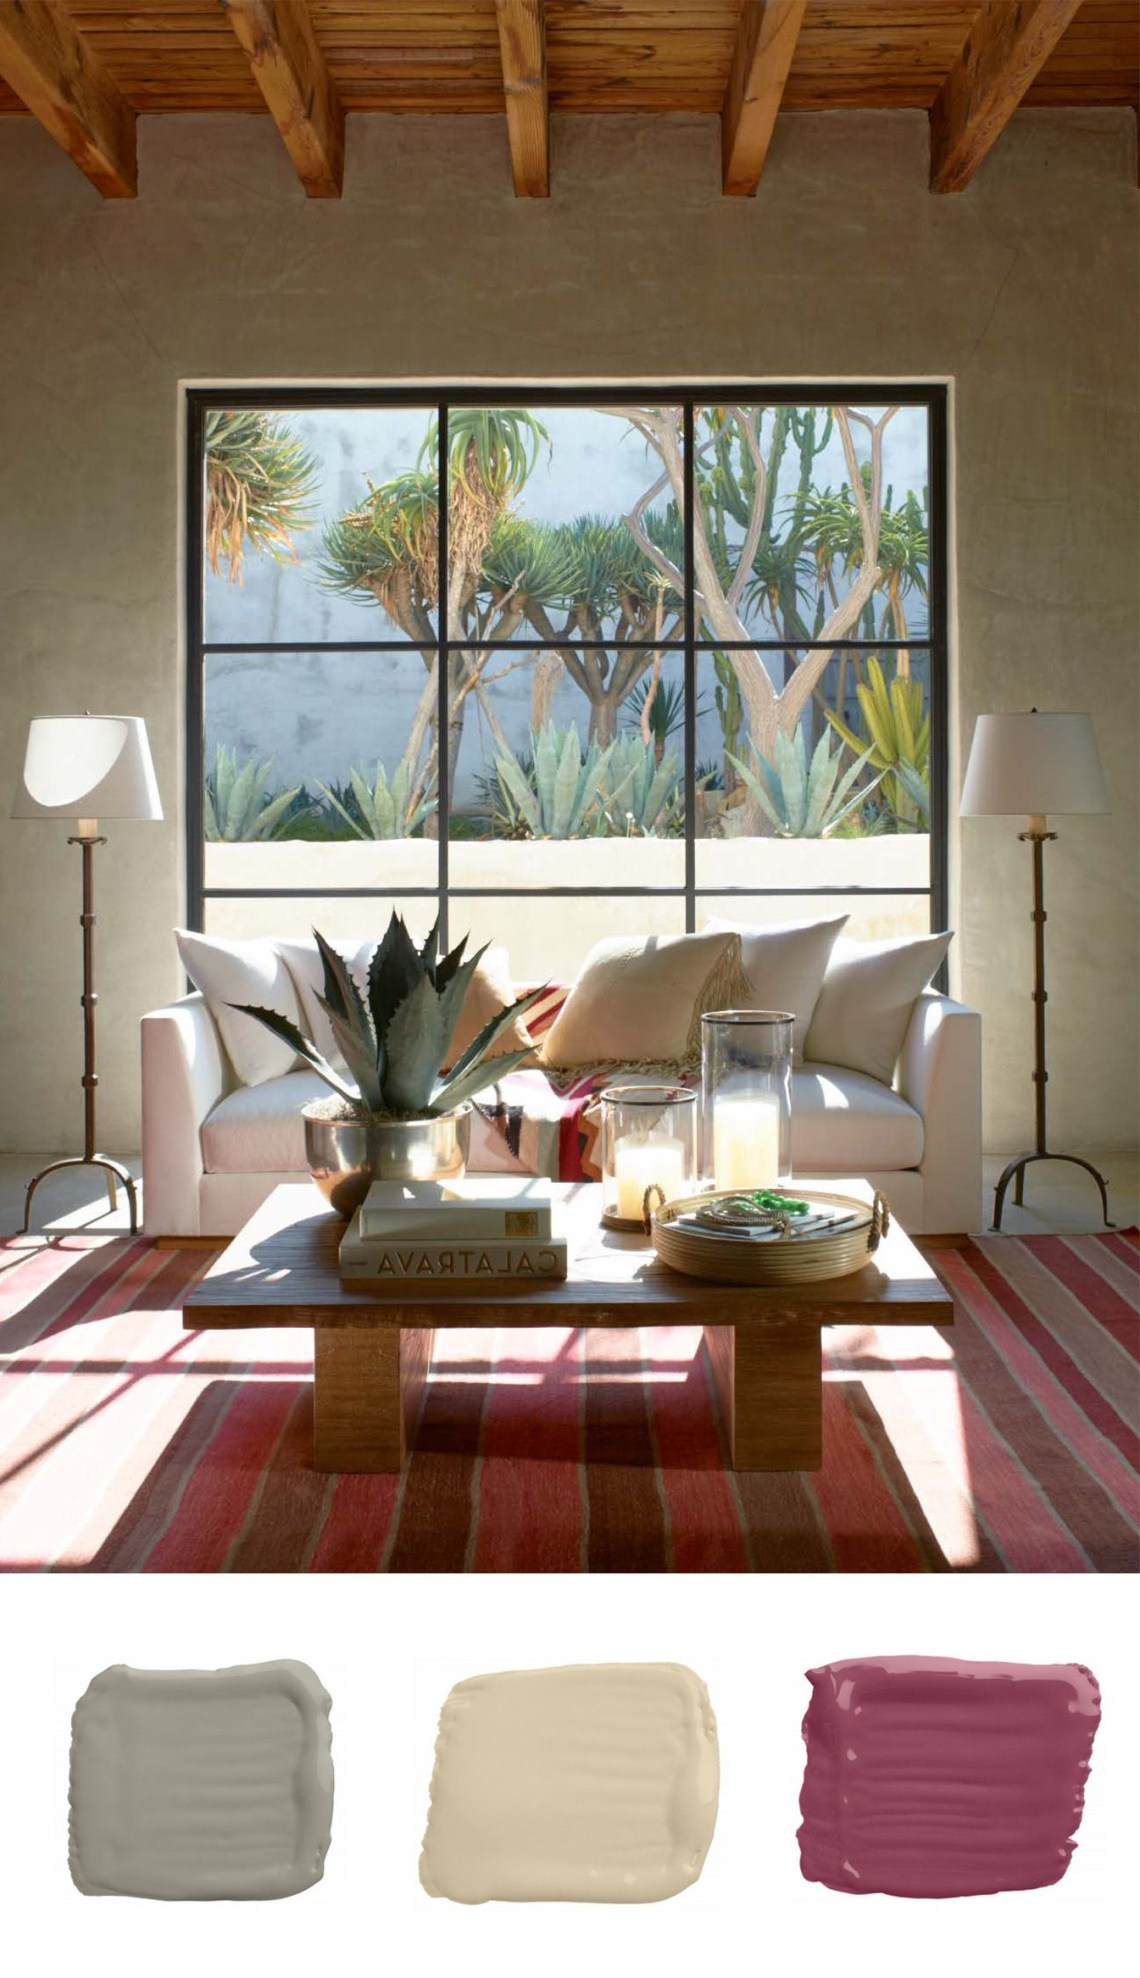 A Ralph Lauren Paint Palette Inspired The Richly Serene